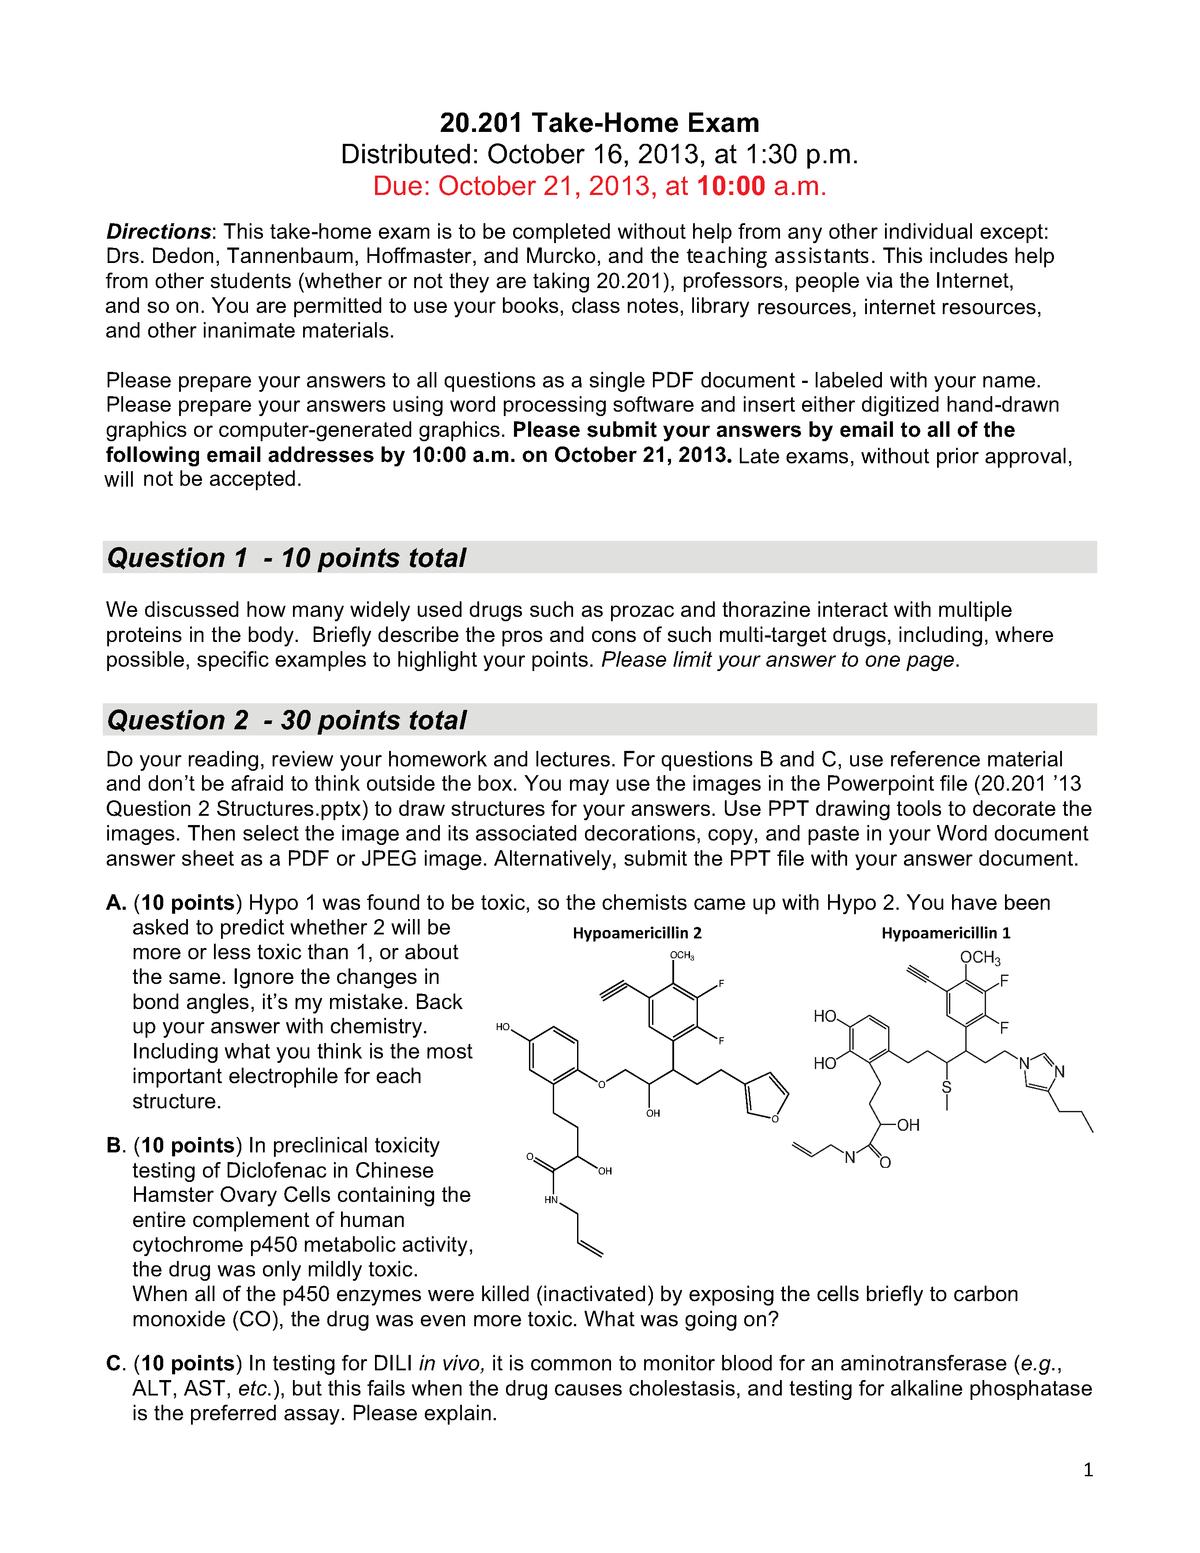 Exam 2013 - 20  201: Mechanisms Of Drug Actions - StuDocu